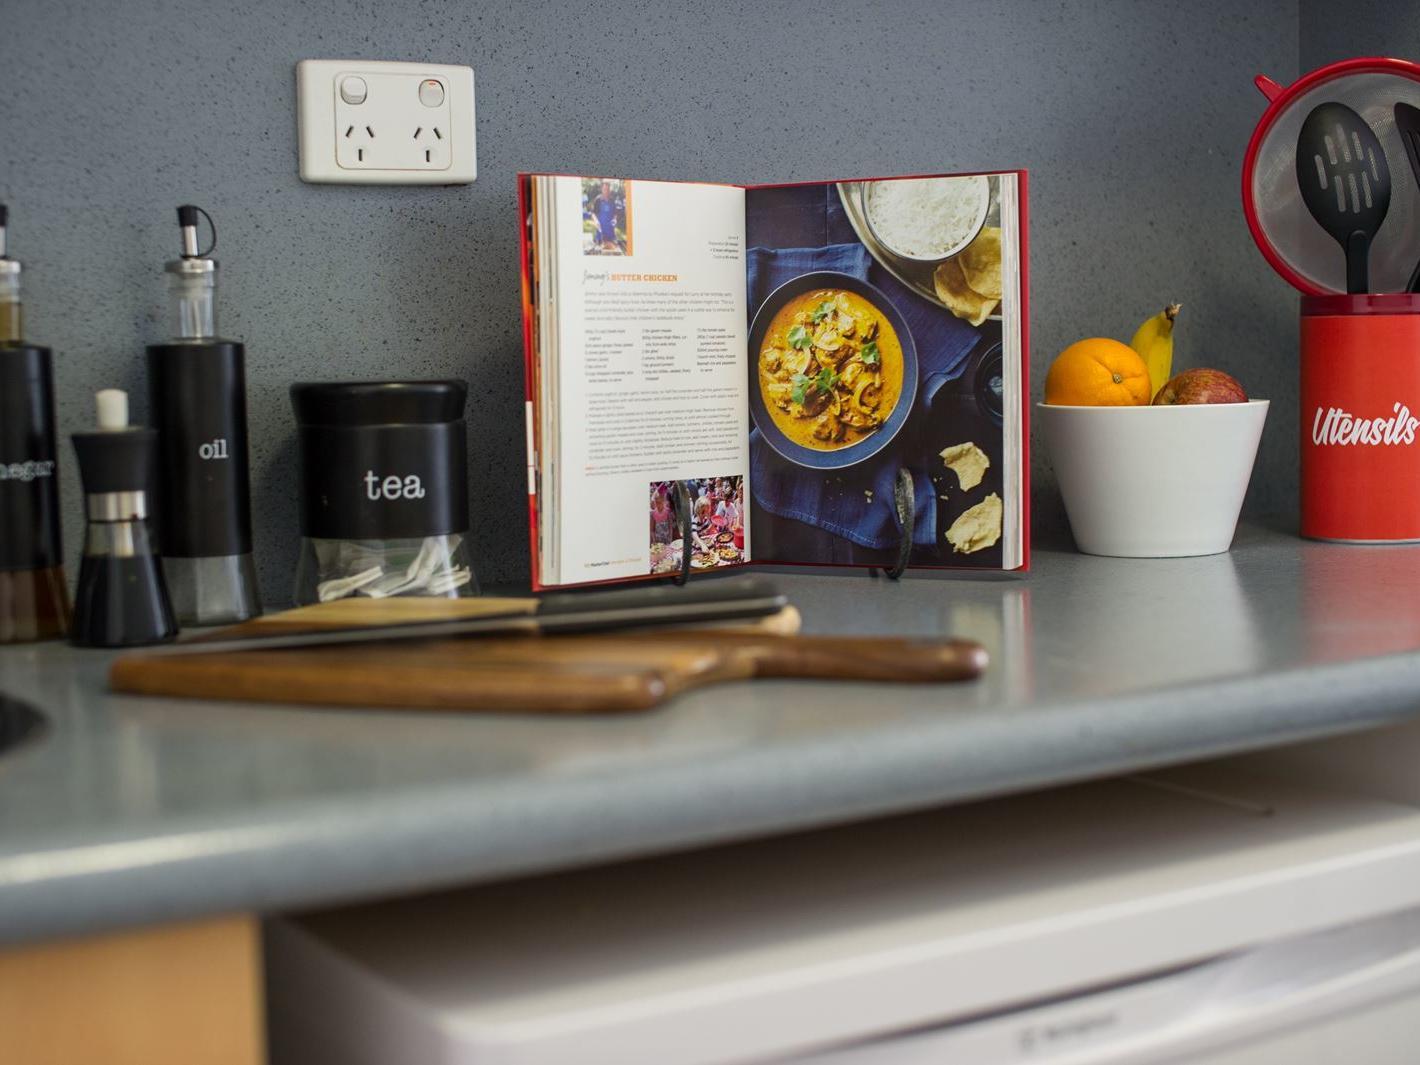 On Margaret _Single Studio Kitchen Bench